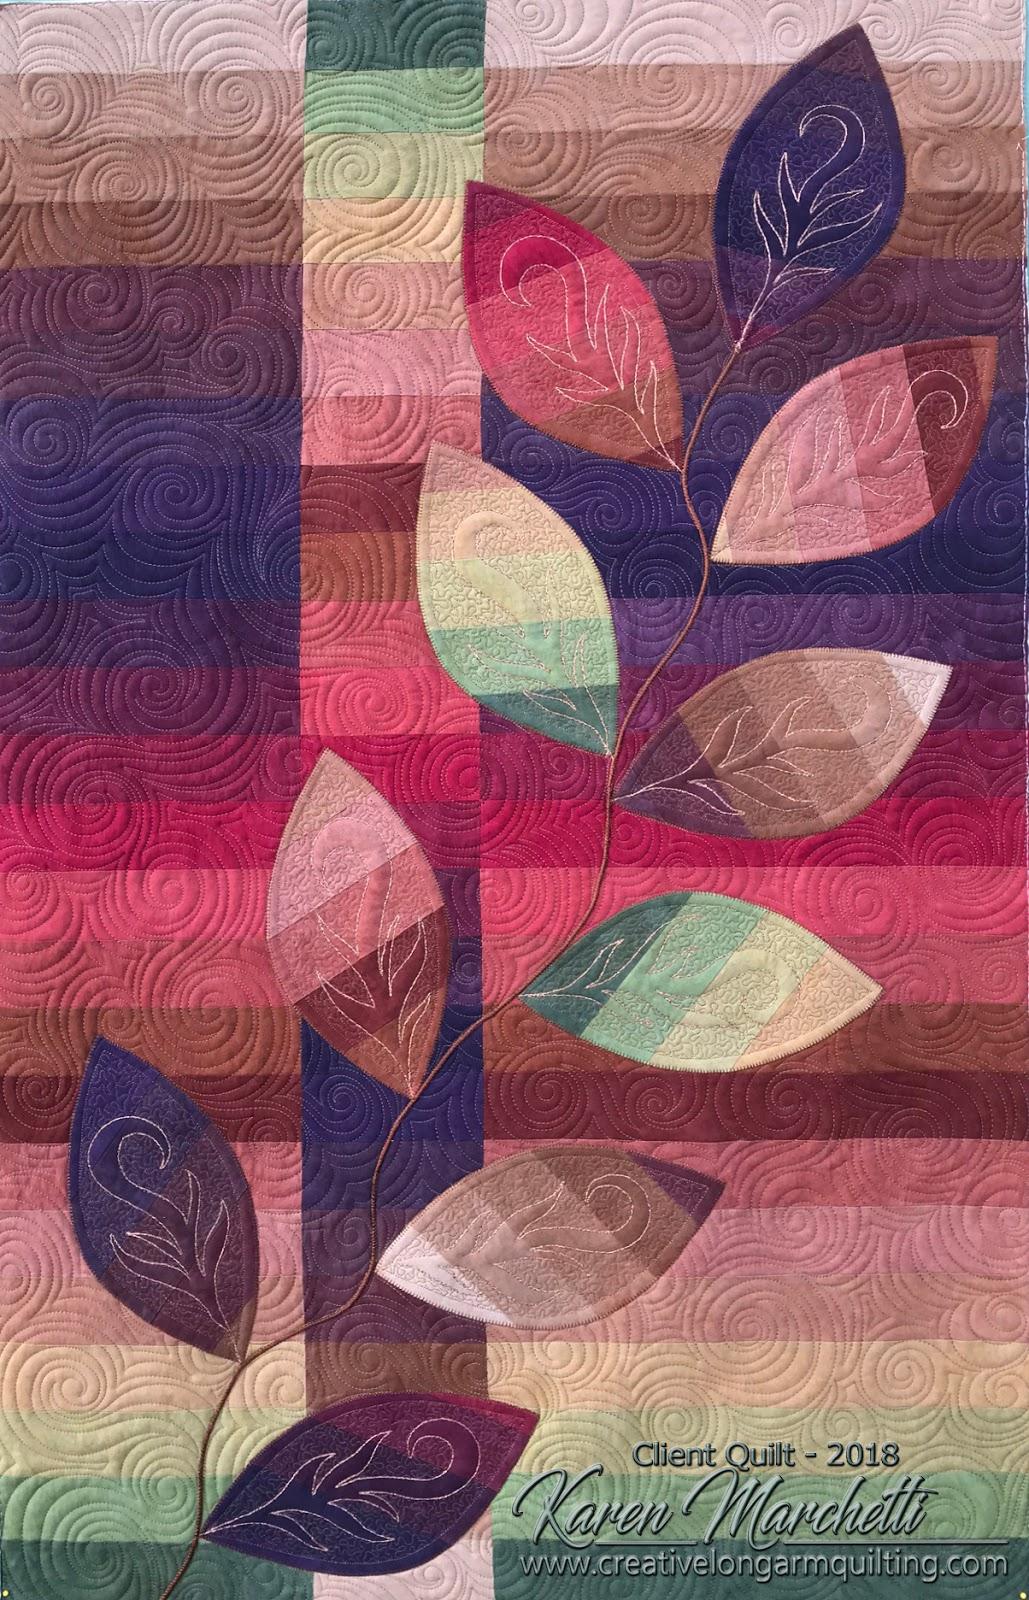 Creative Longarm Quilting by Karen Marchetti : longarm quilting blogs - Adamdwight.com